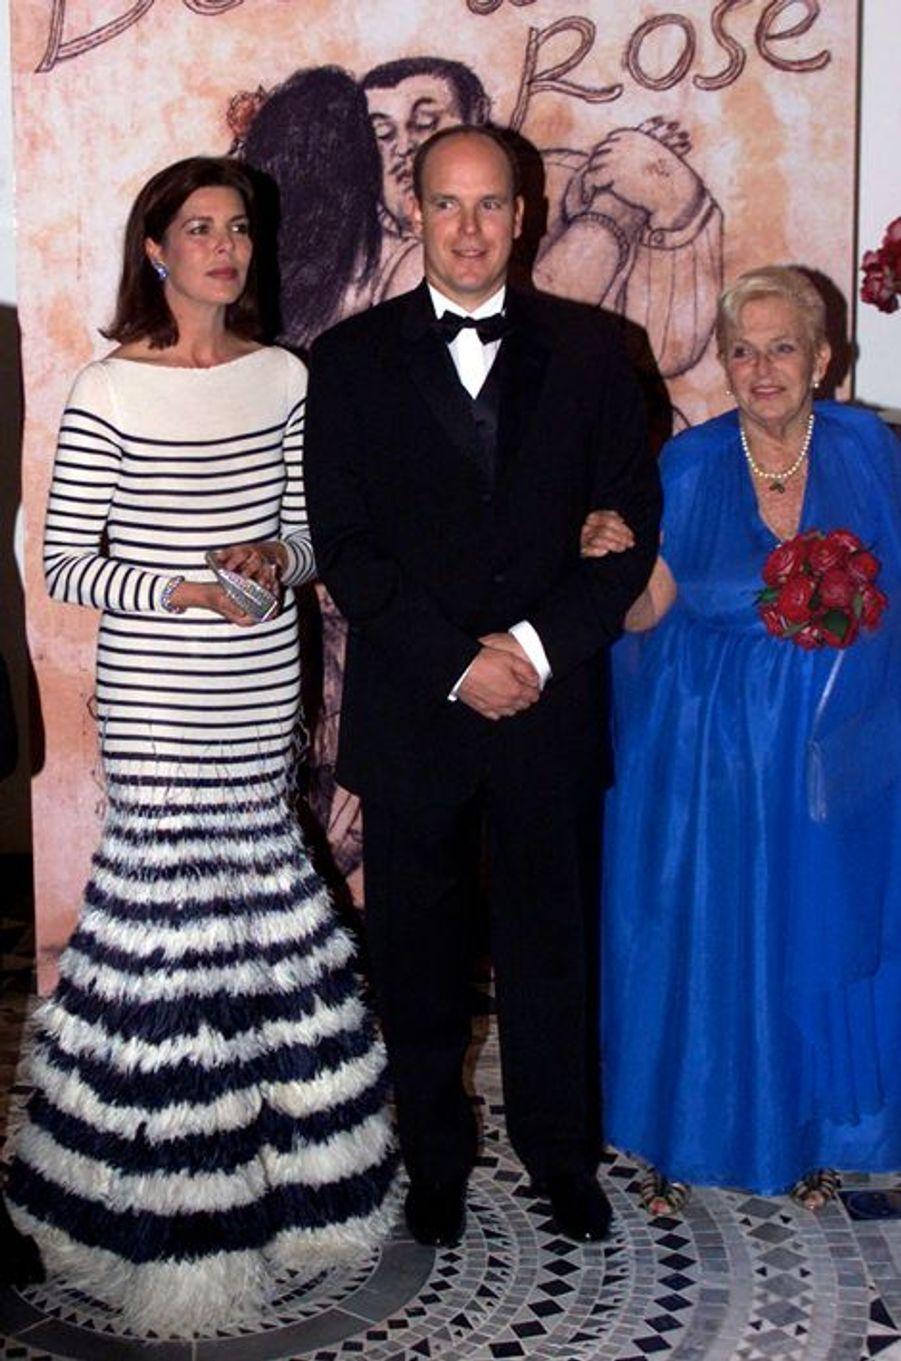 La princesse Caroline de Monaco au bal de la Rose 2000, avec le prince Albert et la princesse Antoinette